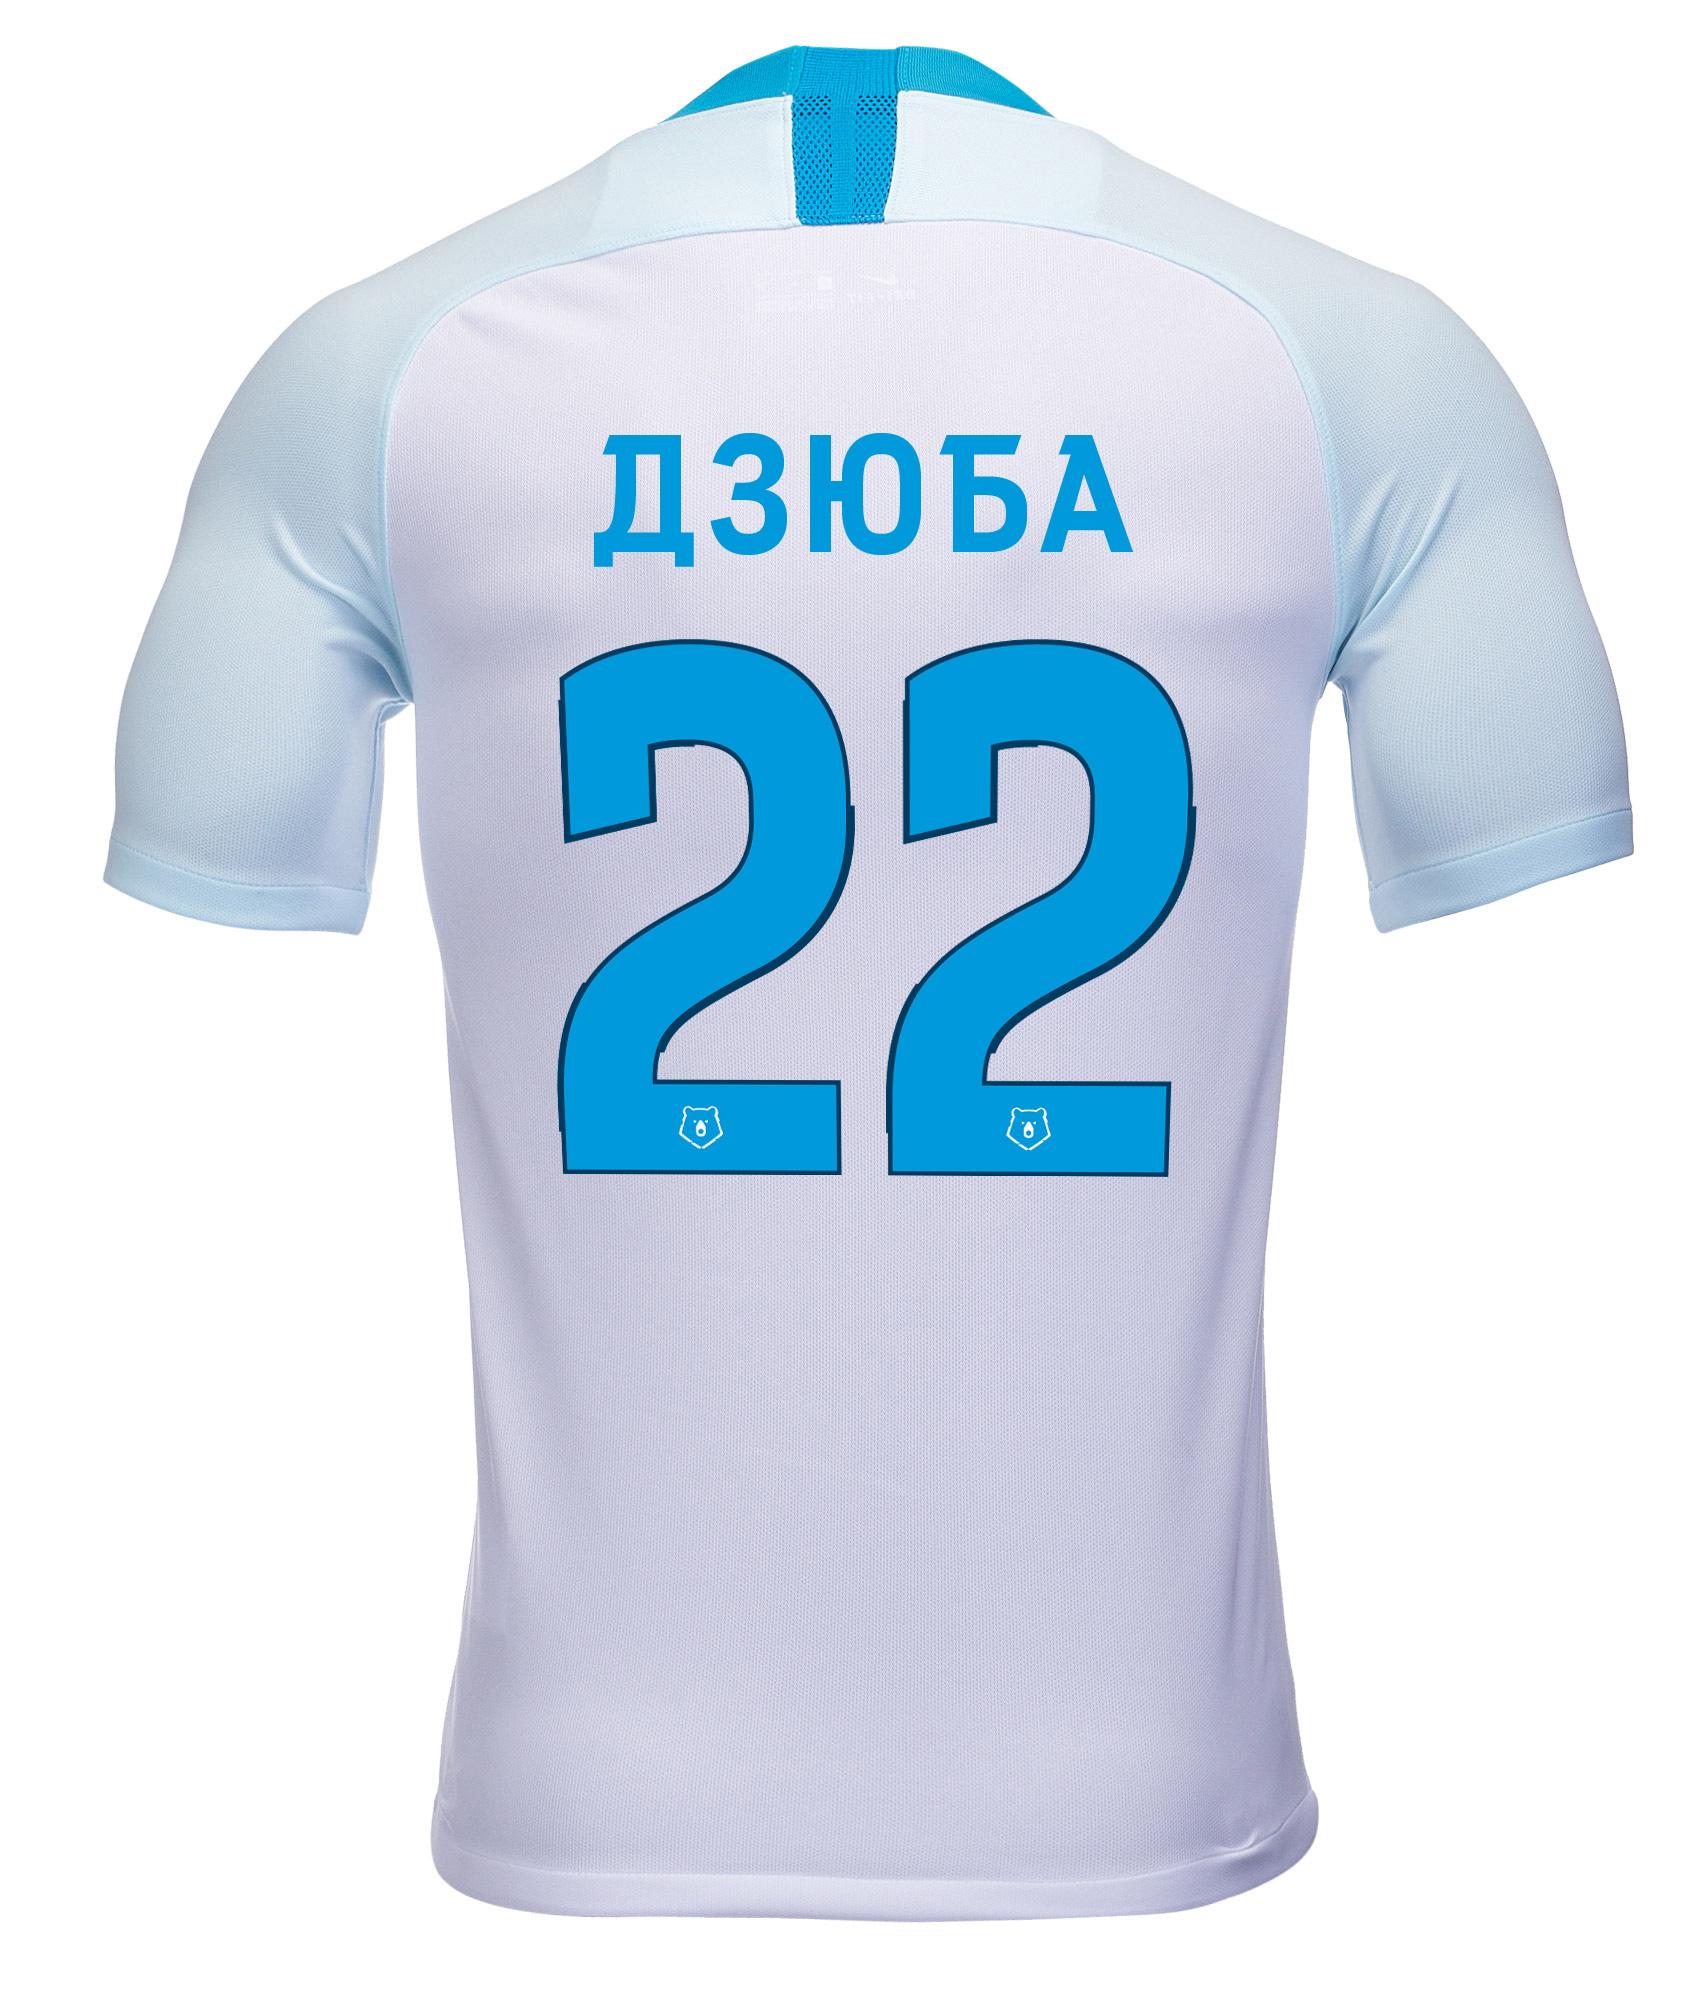 Футболка выездная Nike Дзюба 22 2018/19 Nike оригинальная домашняя футболка nike дзюба 22 2018 19 nike